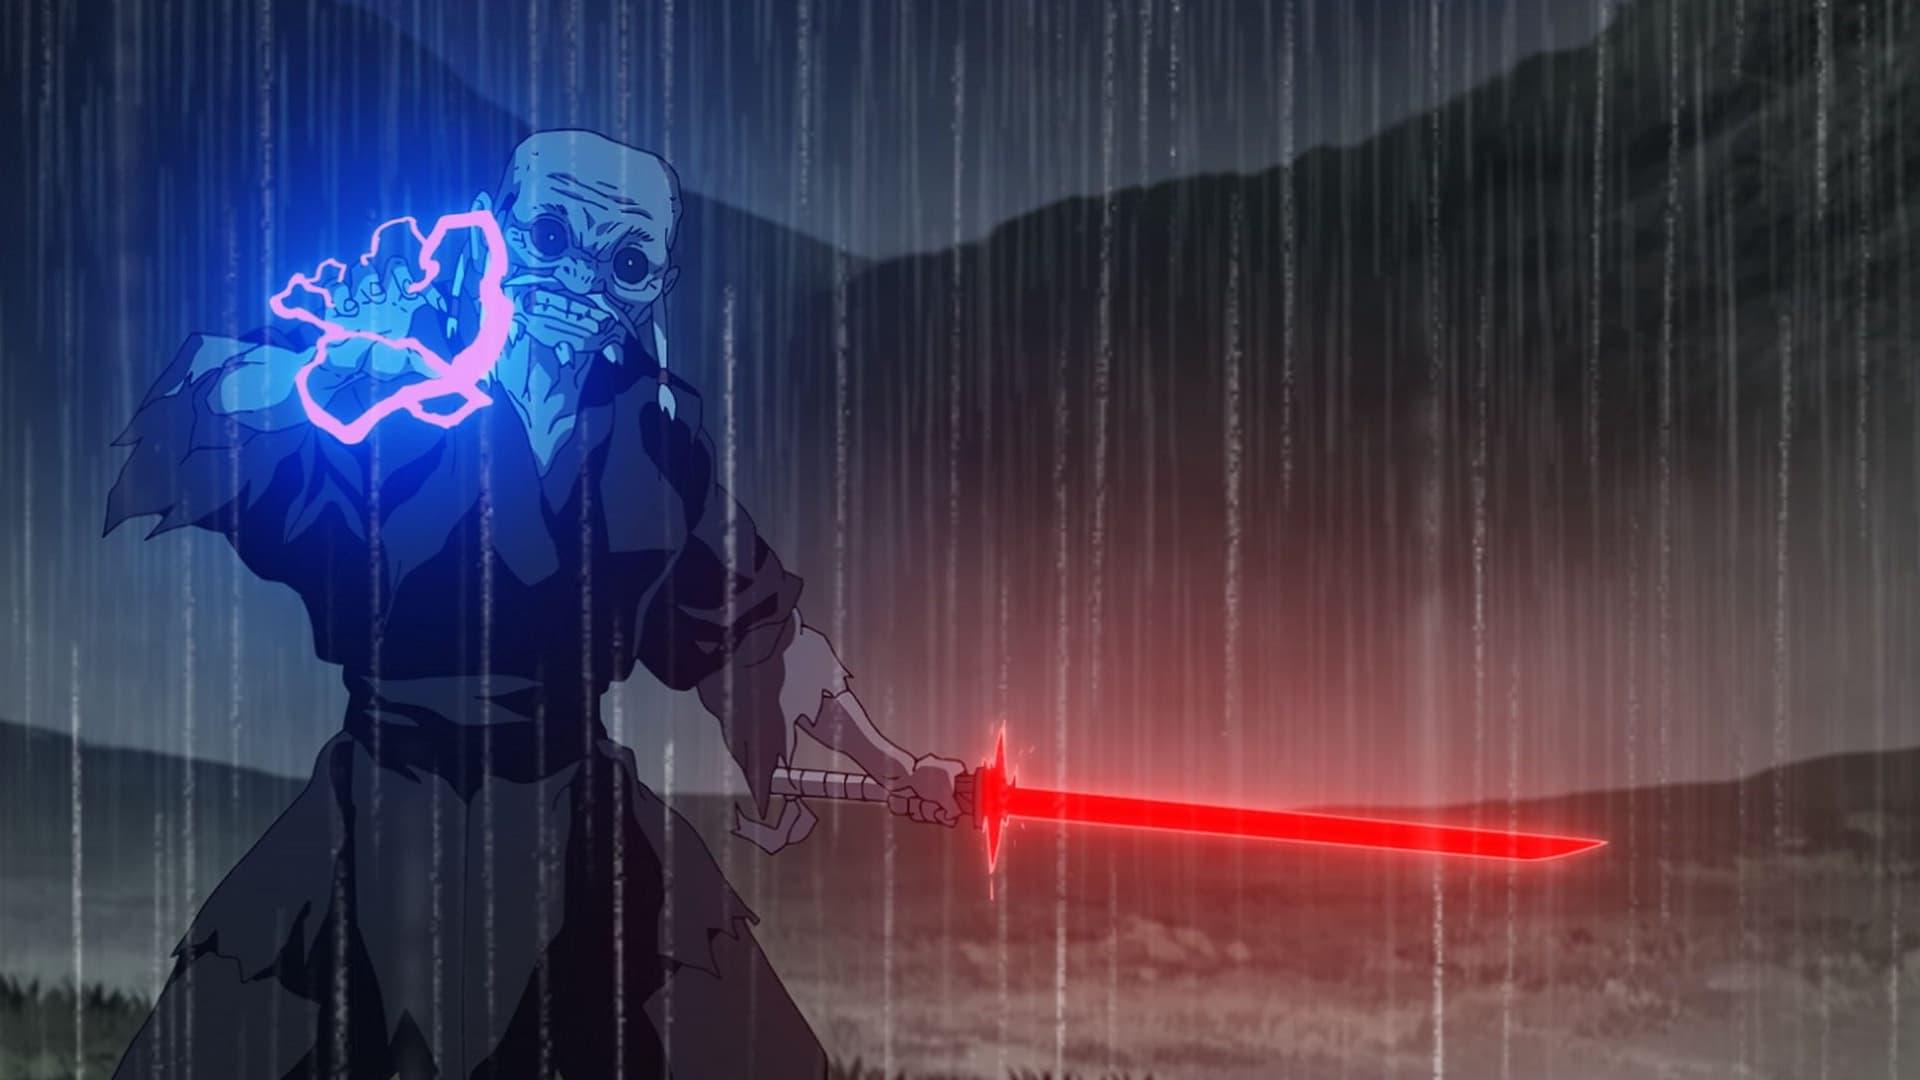 REVIEW Star Wars Visions: el mejor anime para ver en Disney Plus